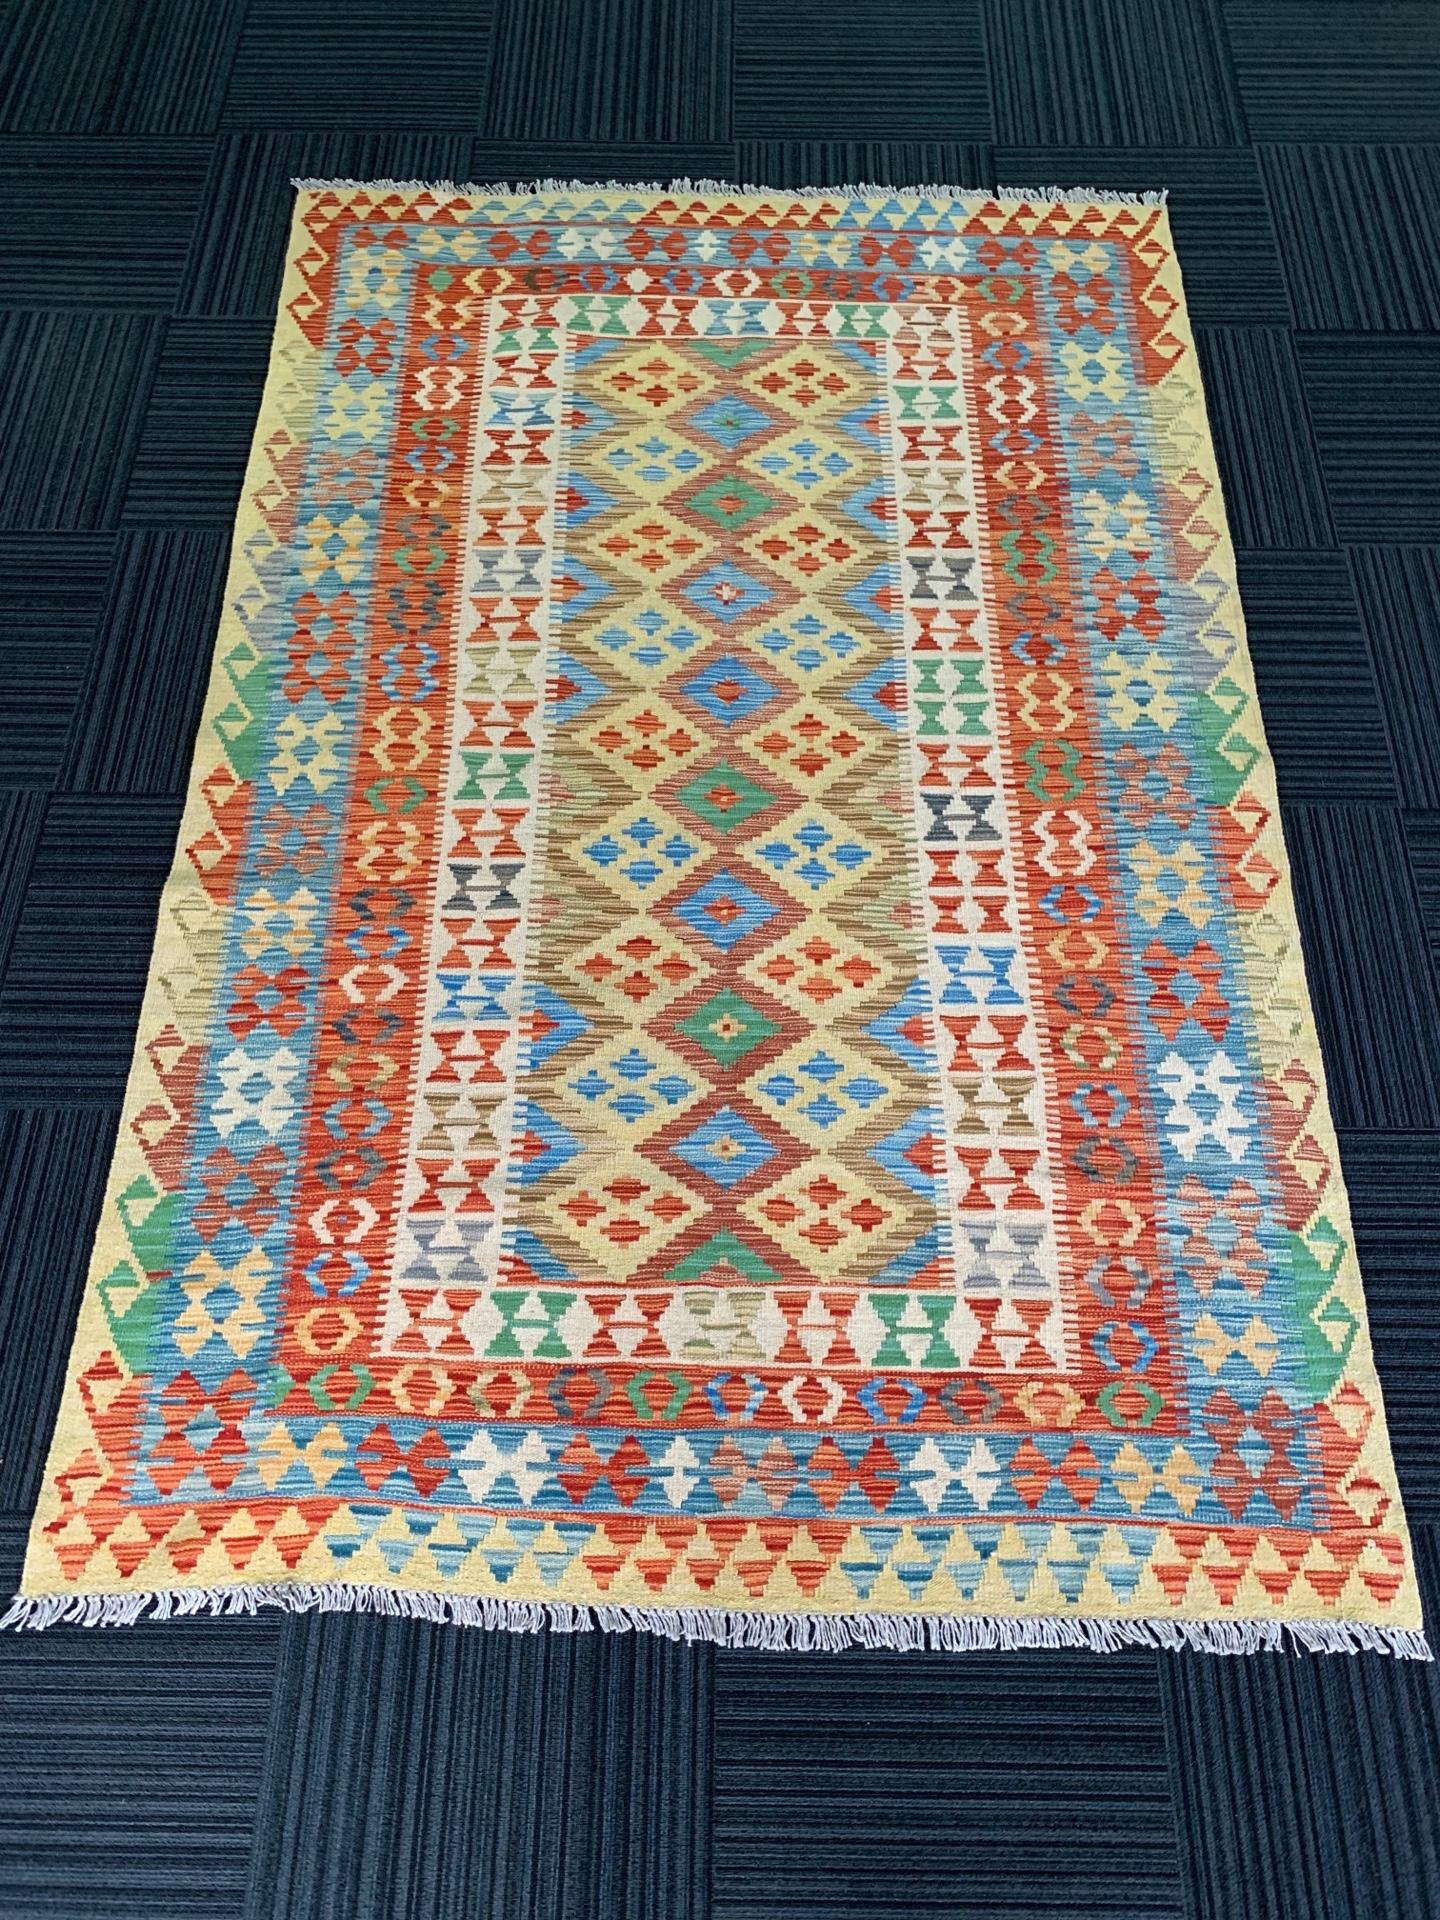 KI0318 アフガンキリム 手織り 160×244